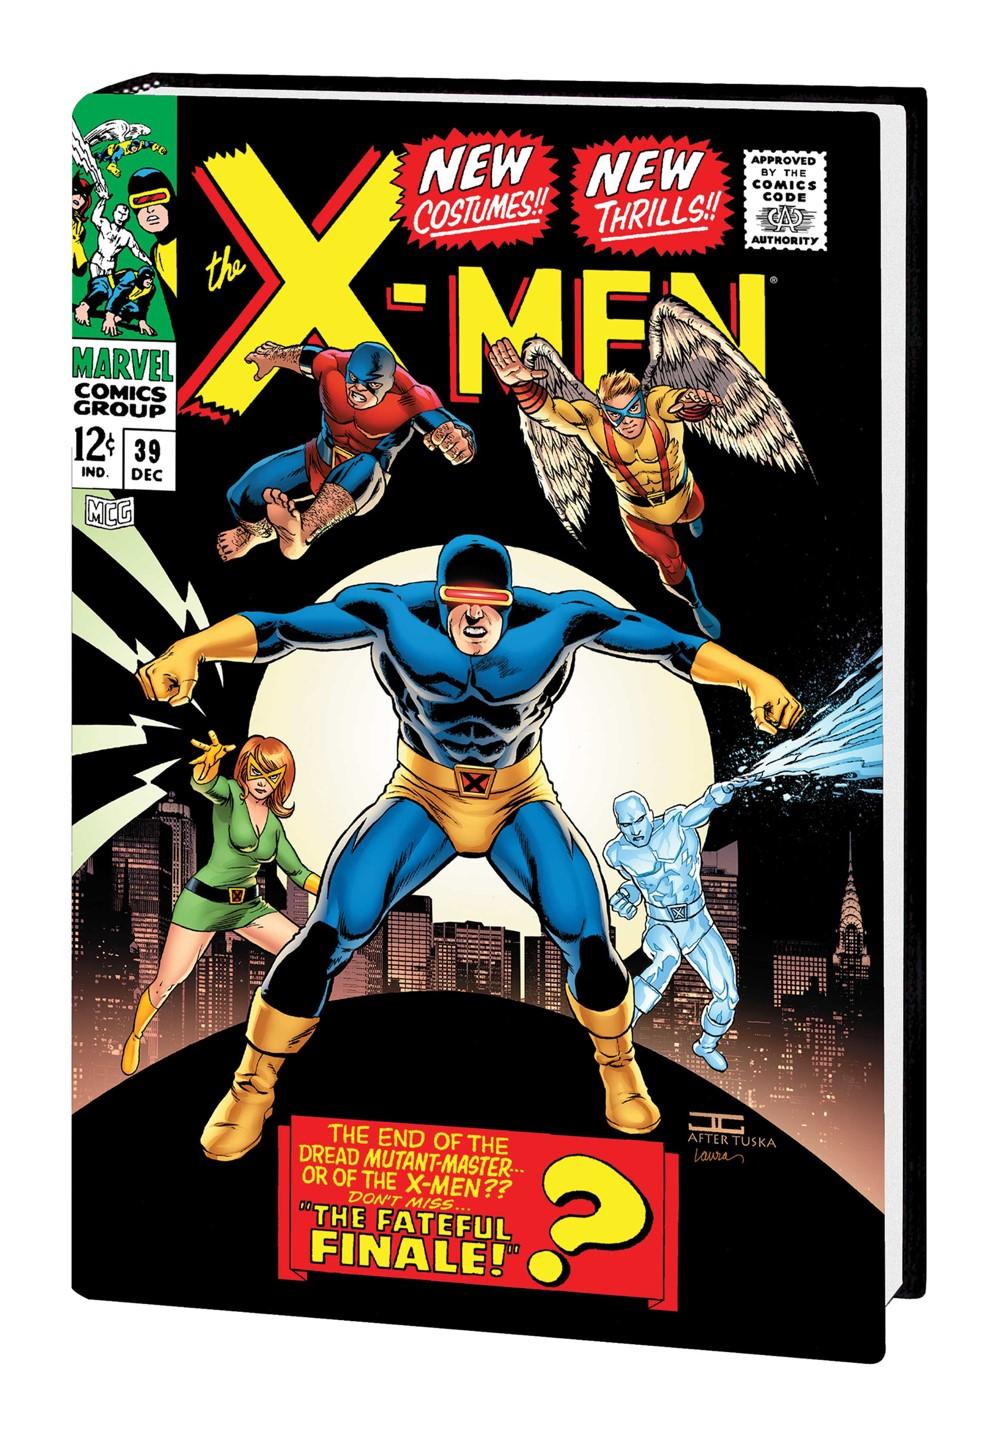 XMEN_OMNI_V2_HC_CASSADAY-1 Marvel Comics September 2021 Solicitations